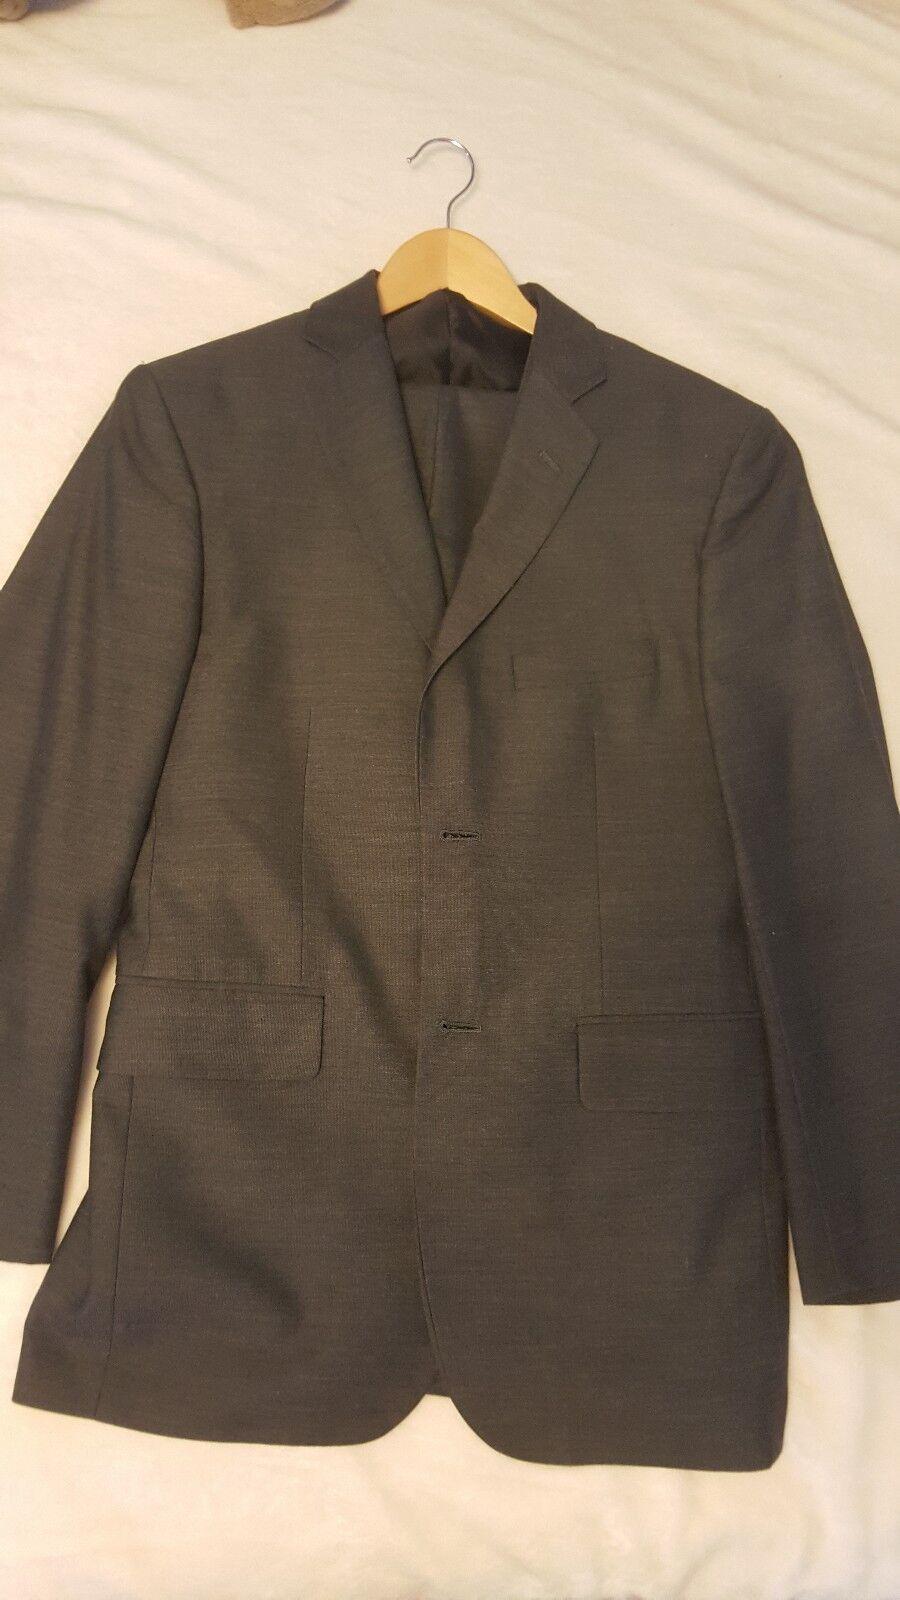 Wilke rodriguez modern fit suit 36R